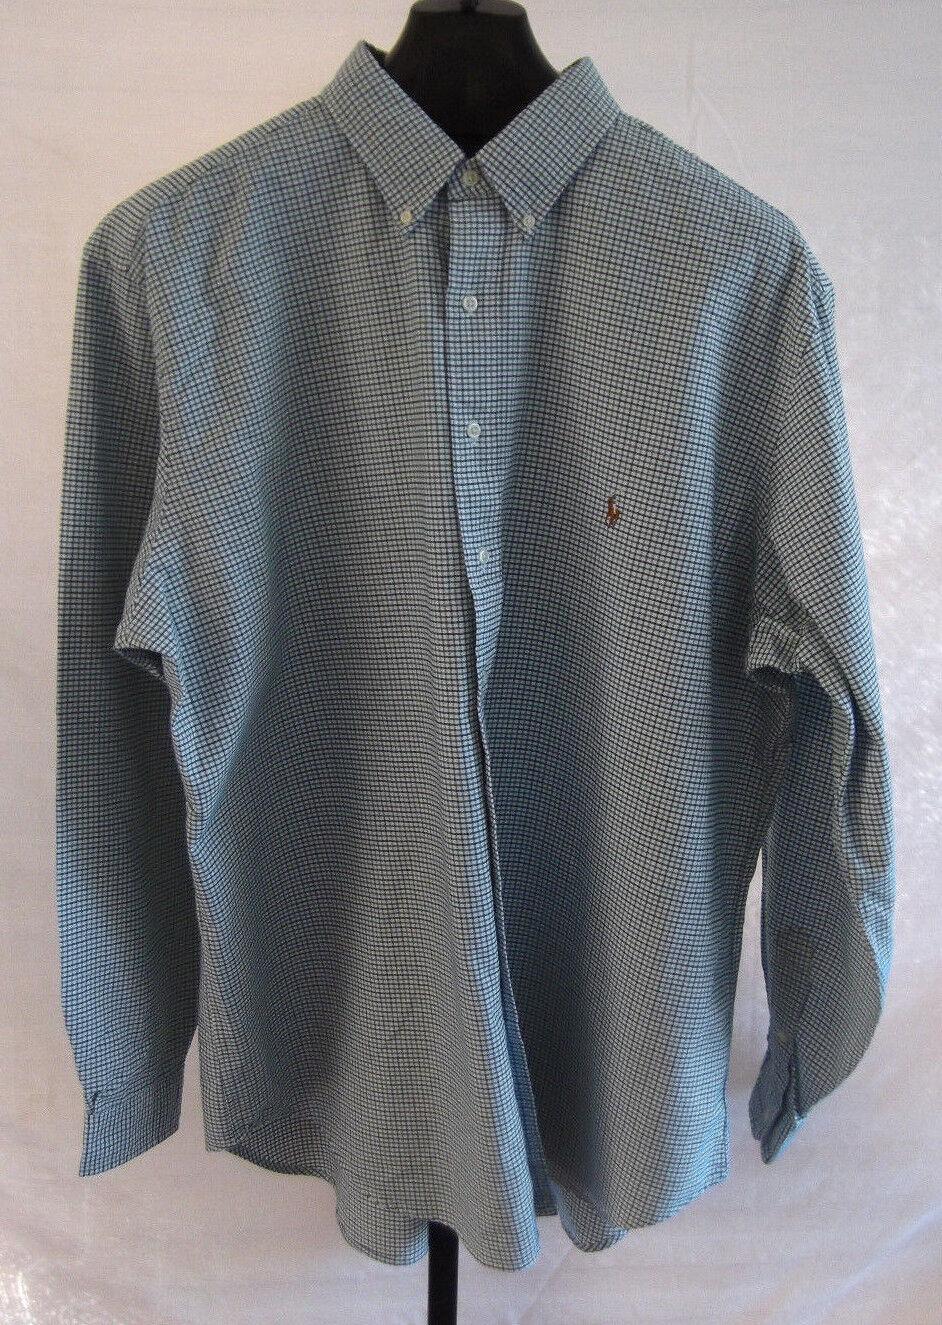 NWT Ralph Lauren Green bluee & White Plaid button LS shirt Mens Size 4X Big